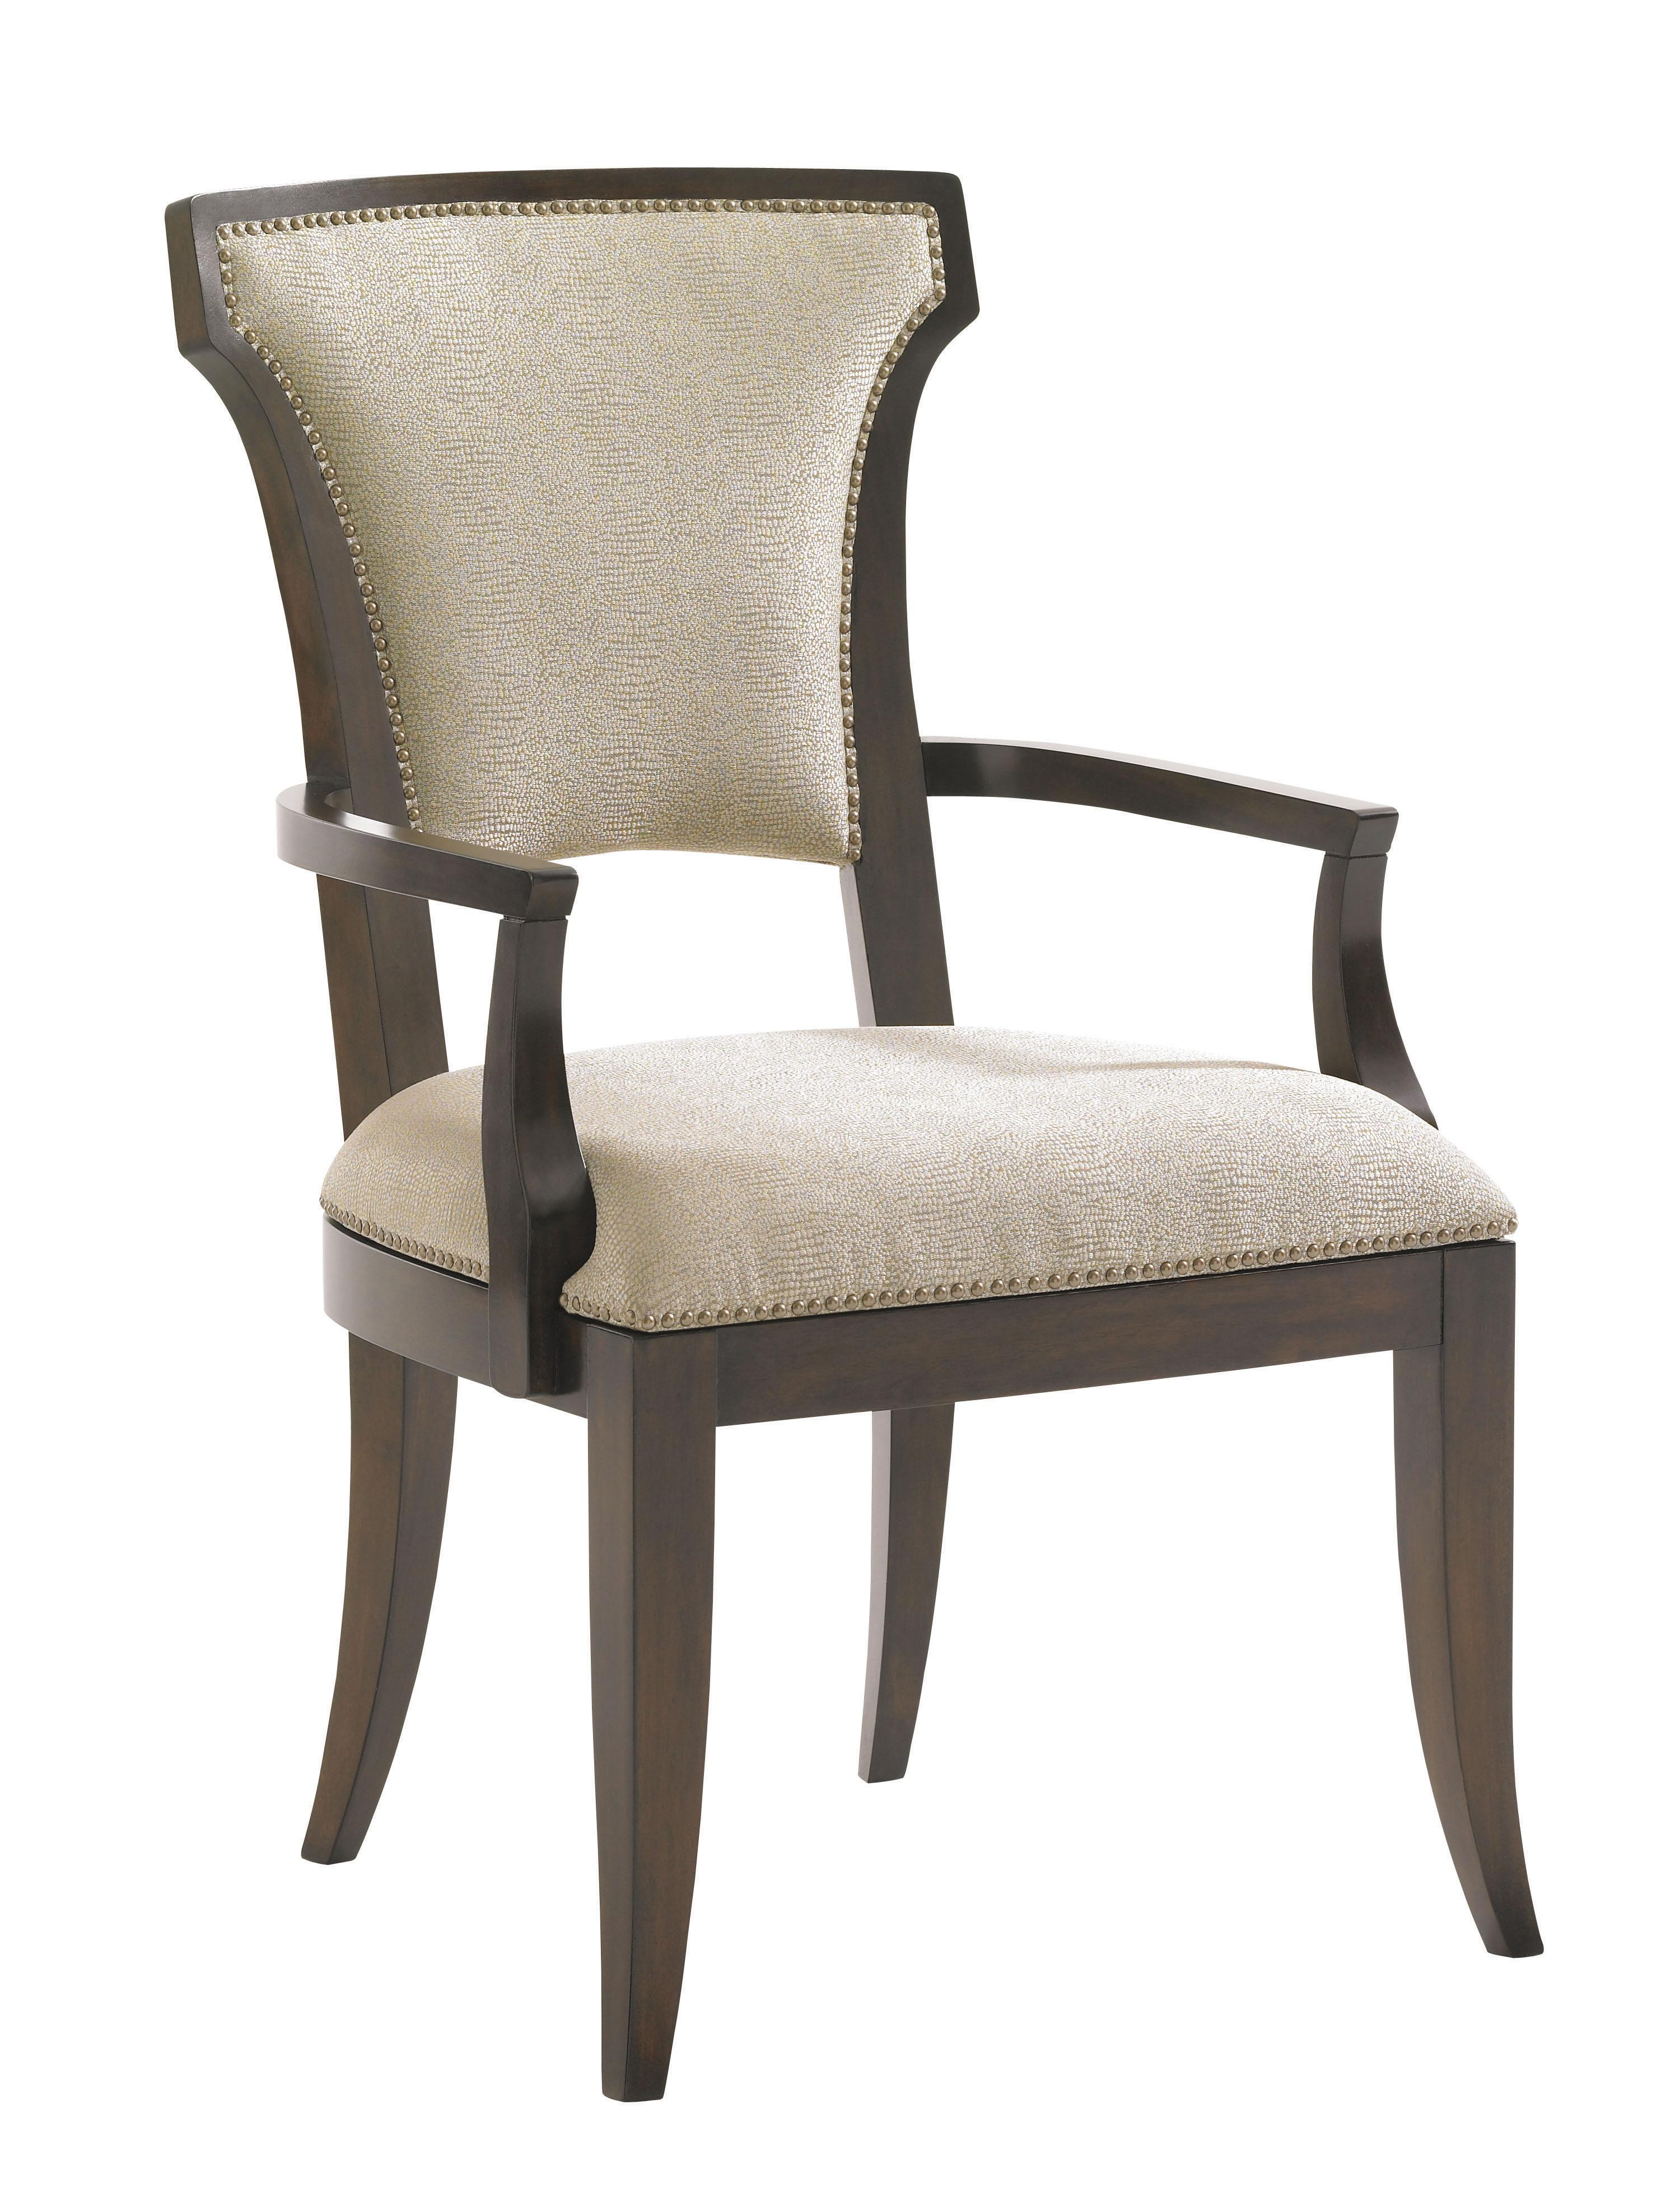 Seneca Quickship Arm Chair